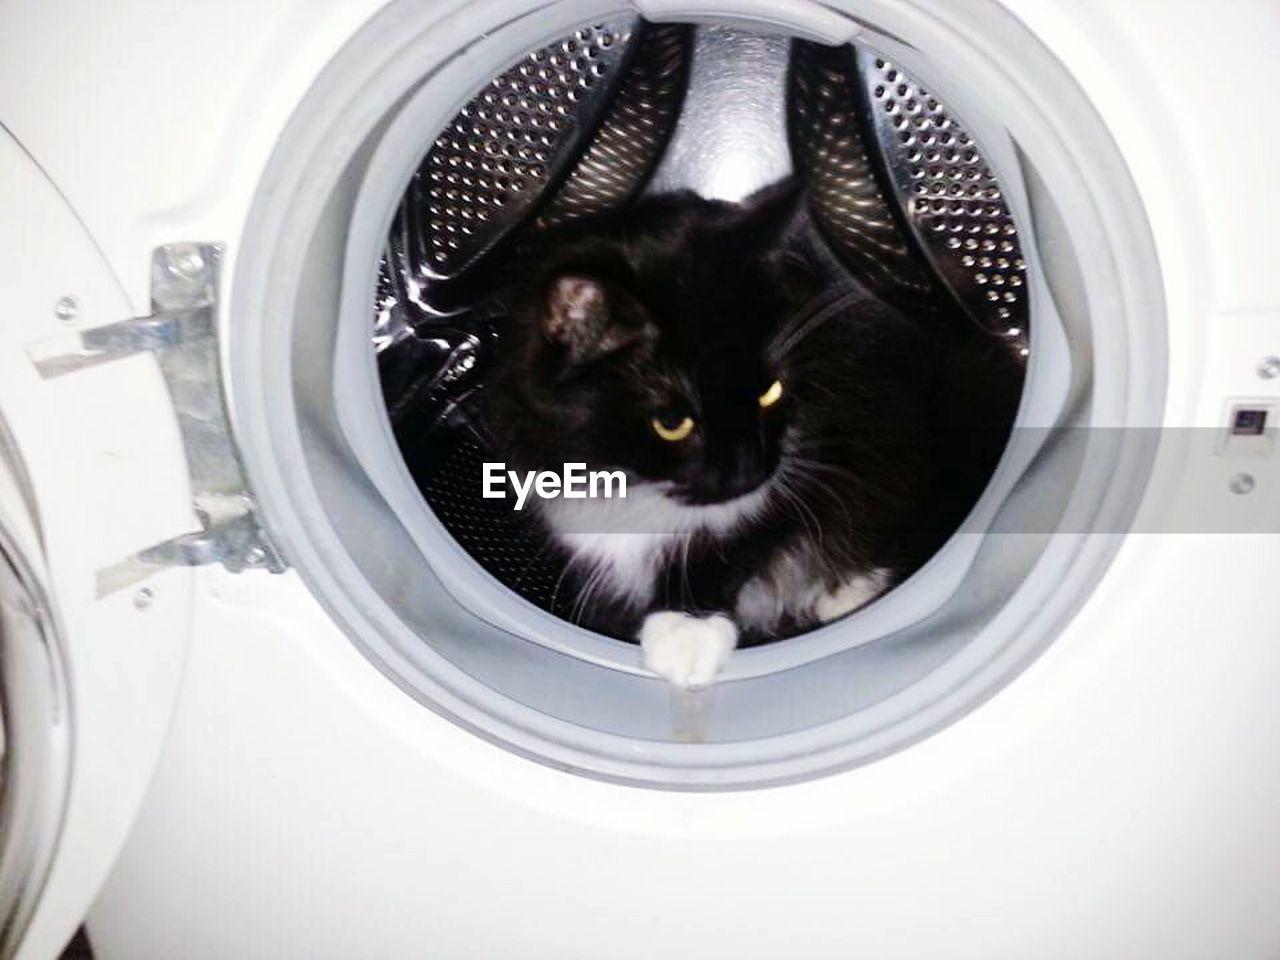 domestic animals, one animal, pets, animal themes, domestic cat, feline, mammal, indoors, washing machine, no people, bathroom, domestic bathroom, whisker, toilet bowl, portrait, close-up, day, flushing toilet